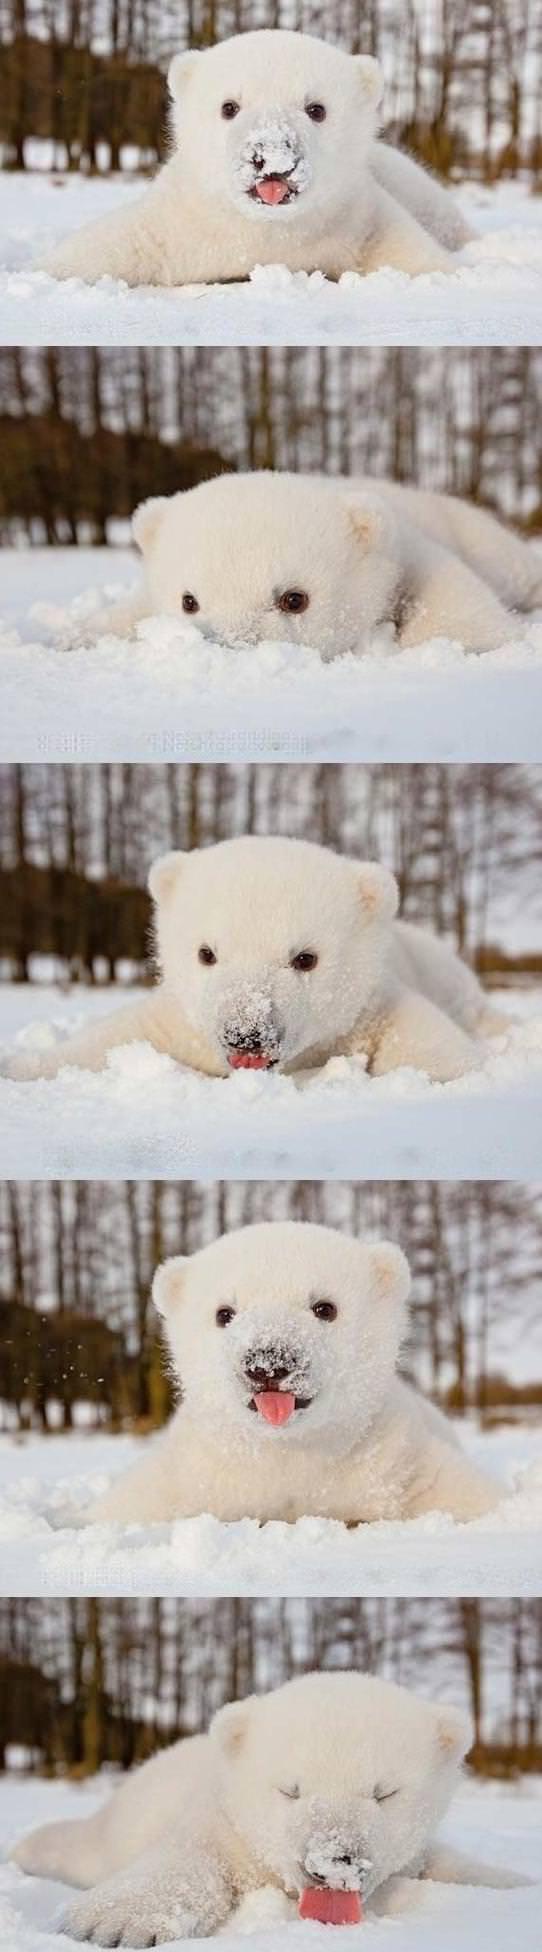 Baby Polar bear licking snow.